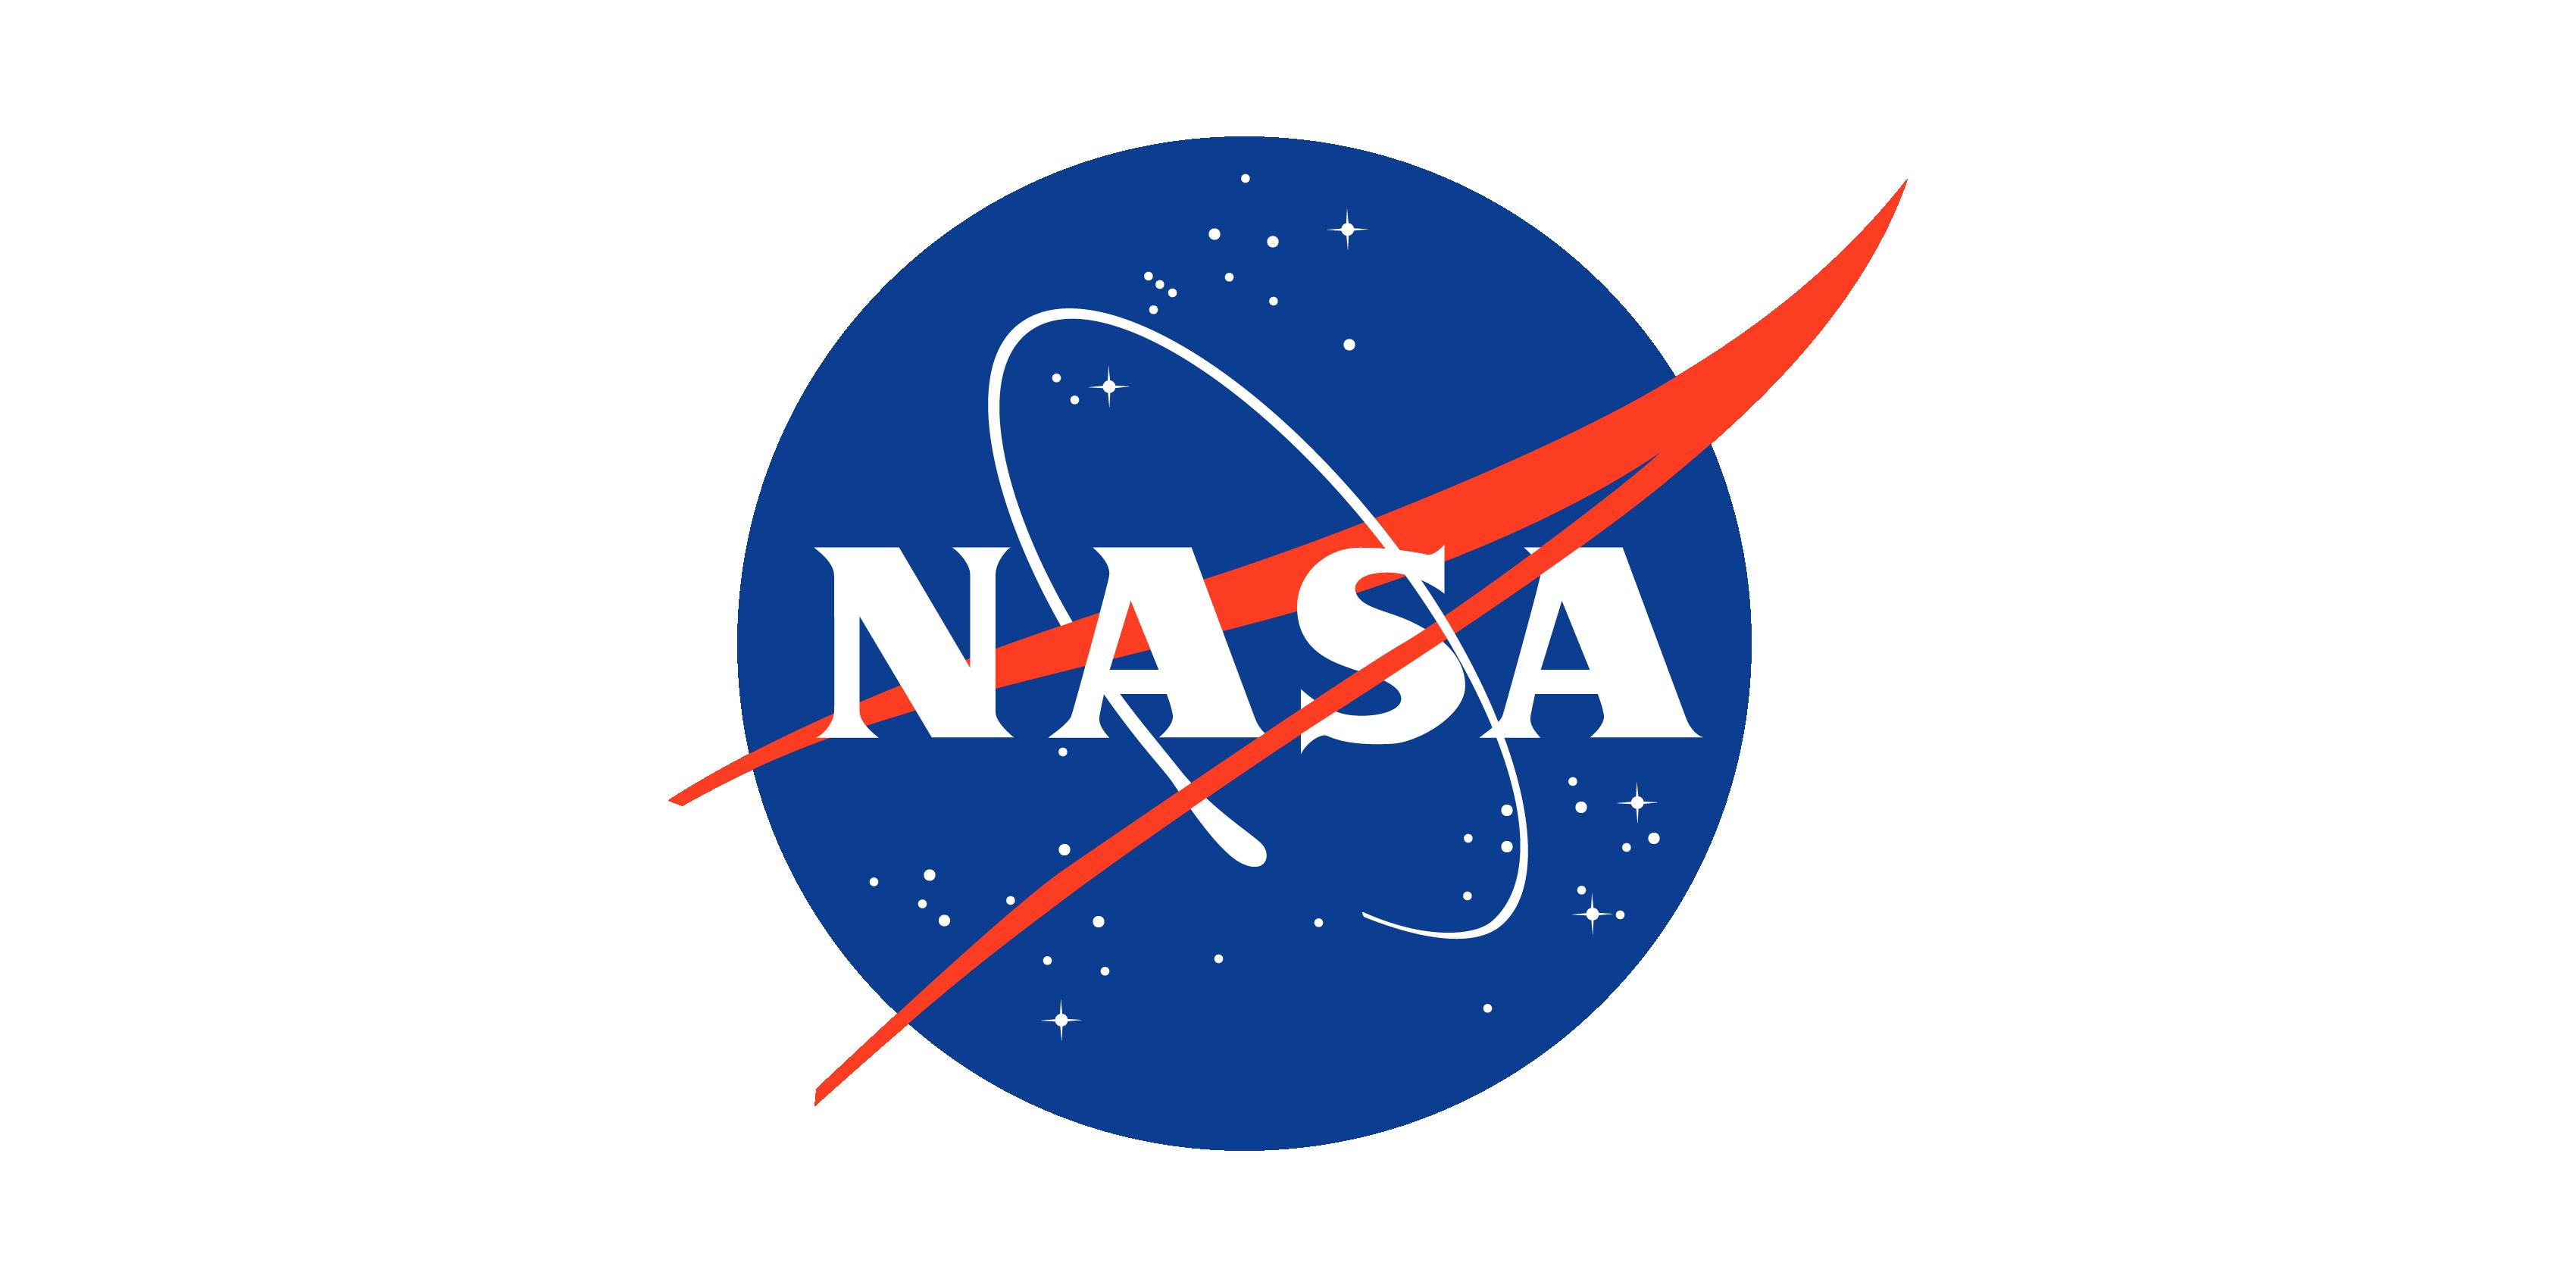 How to get employed at NASA